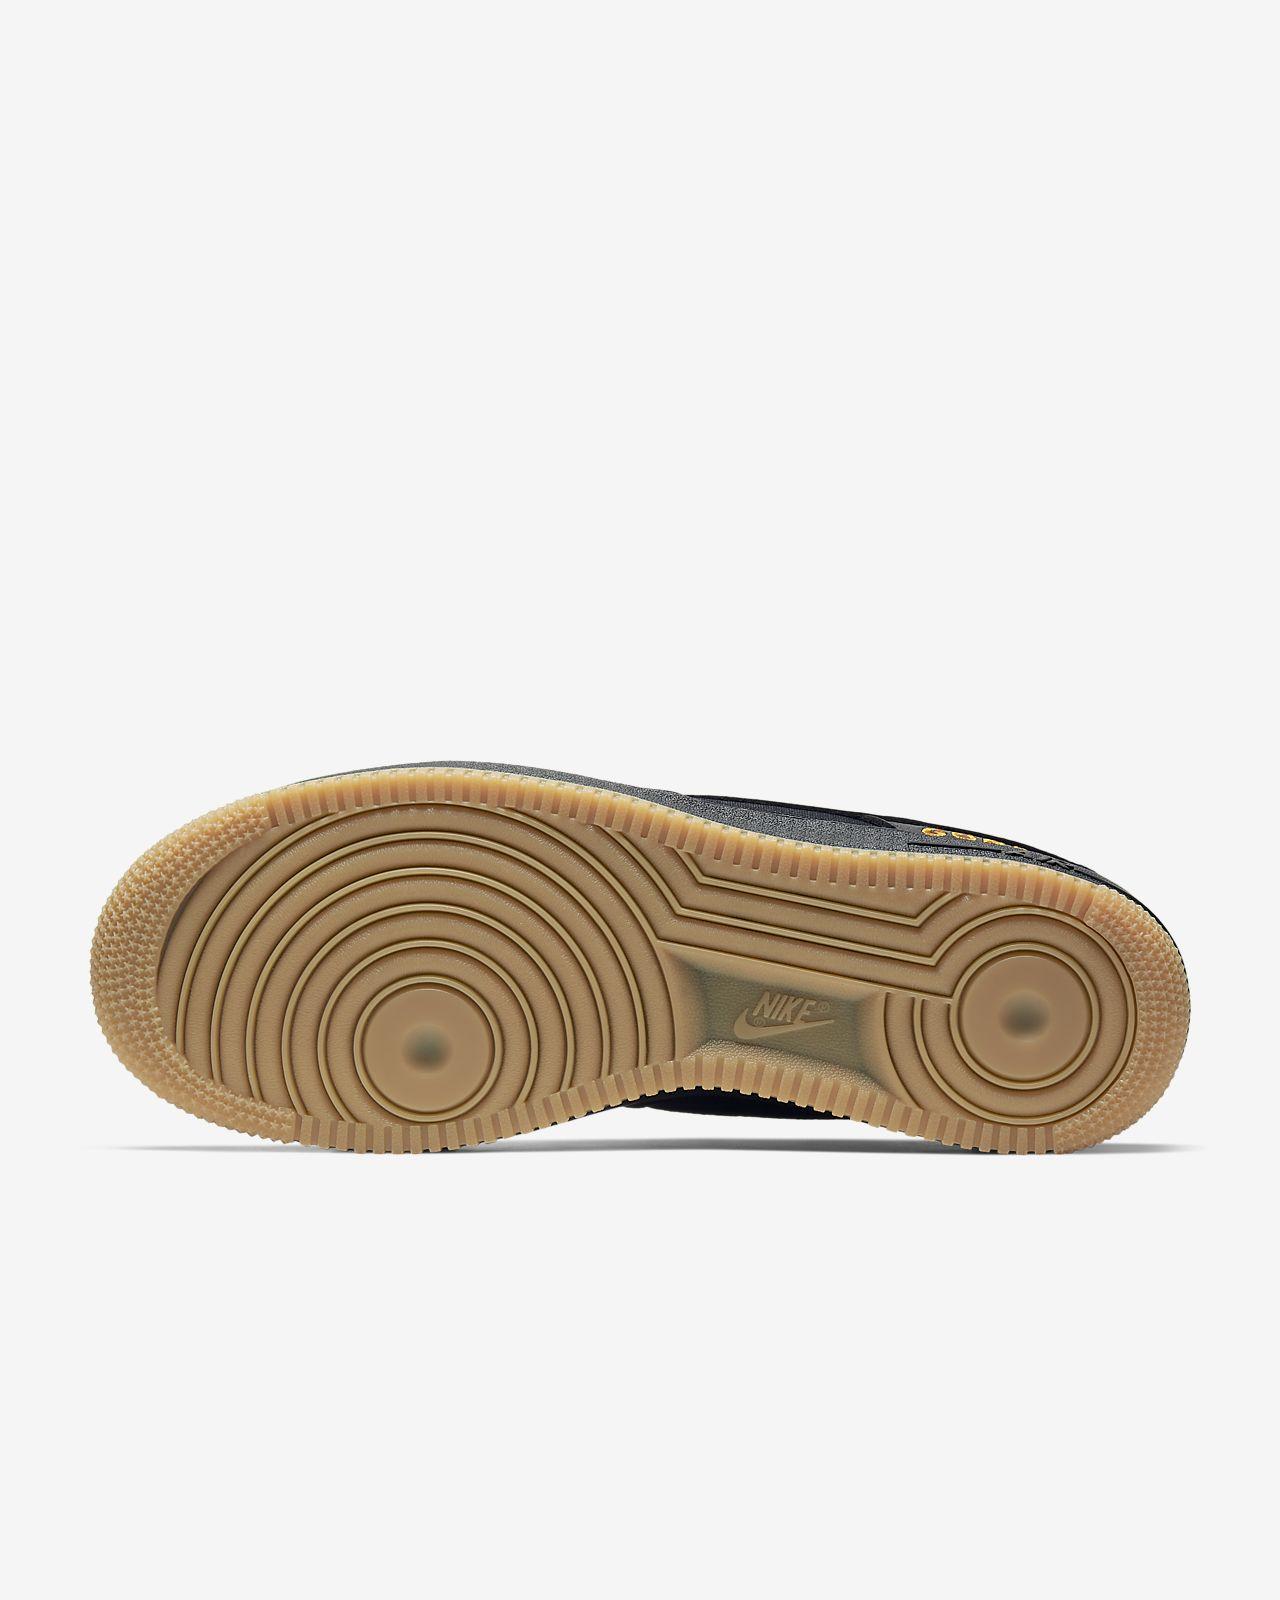 Nike Force TEX Air GORE Schuh 1 kiTOPXZu